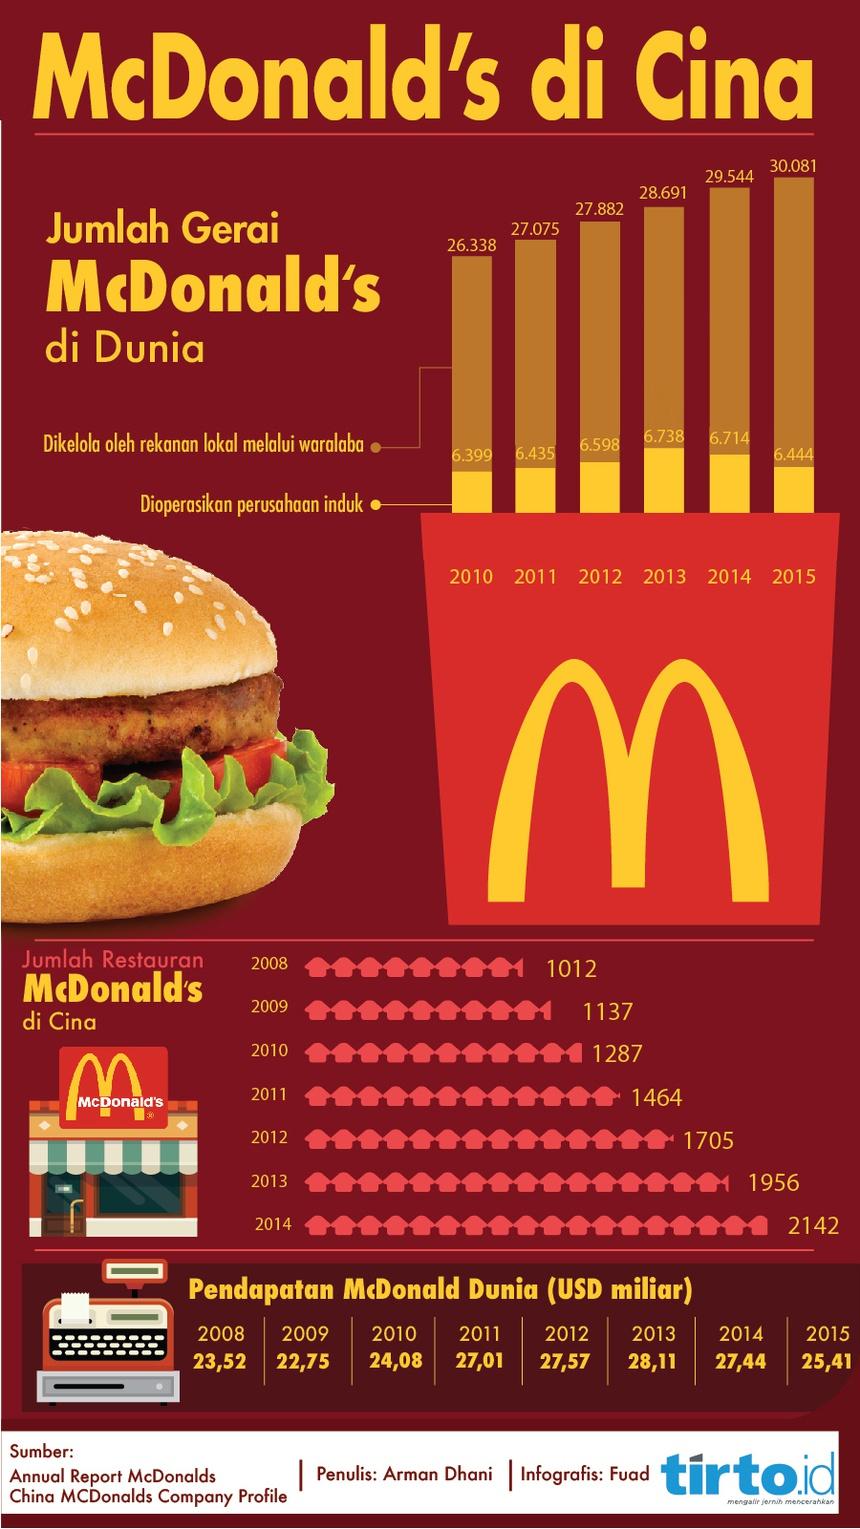 annual report of mcdonalds